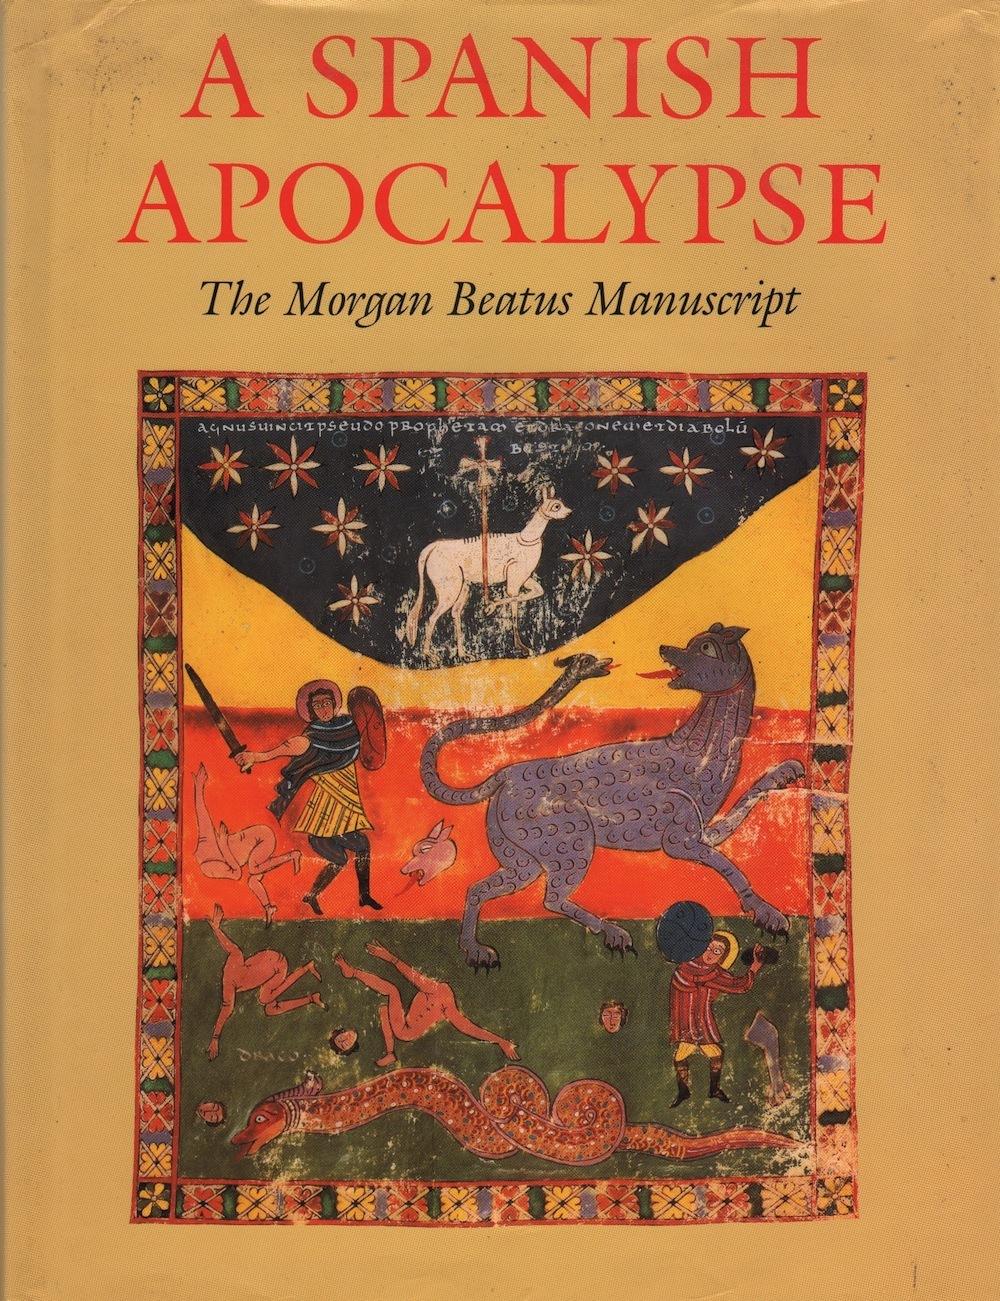 A Spanish Apocalypse: The Morgan Beatus Manuscript